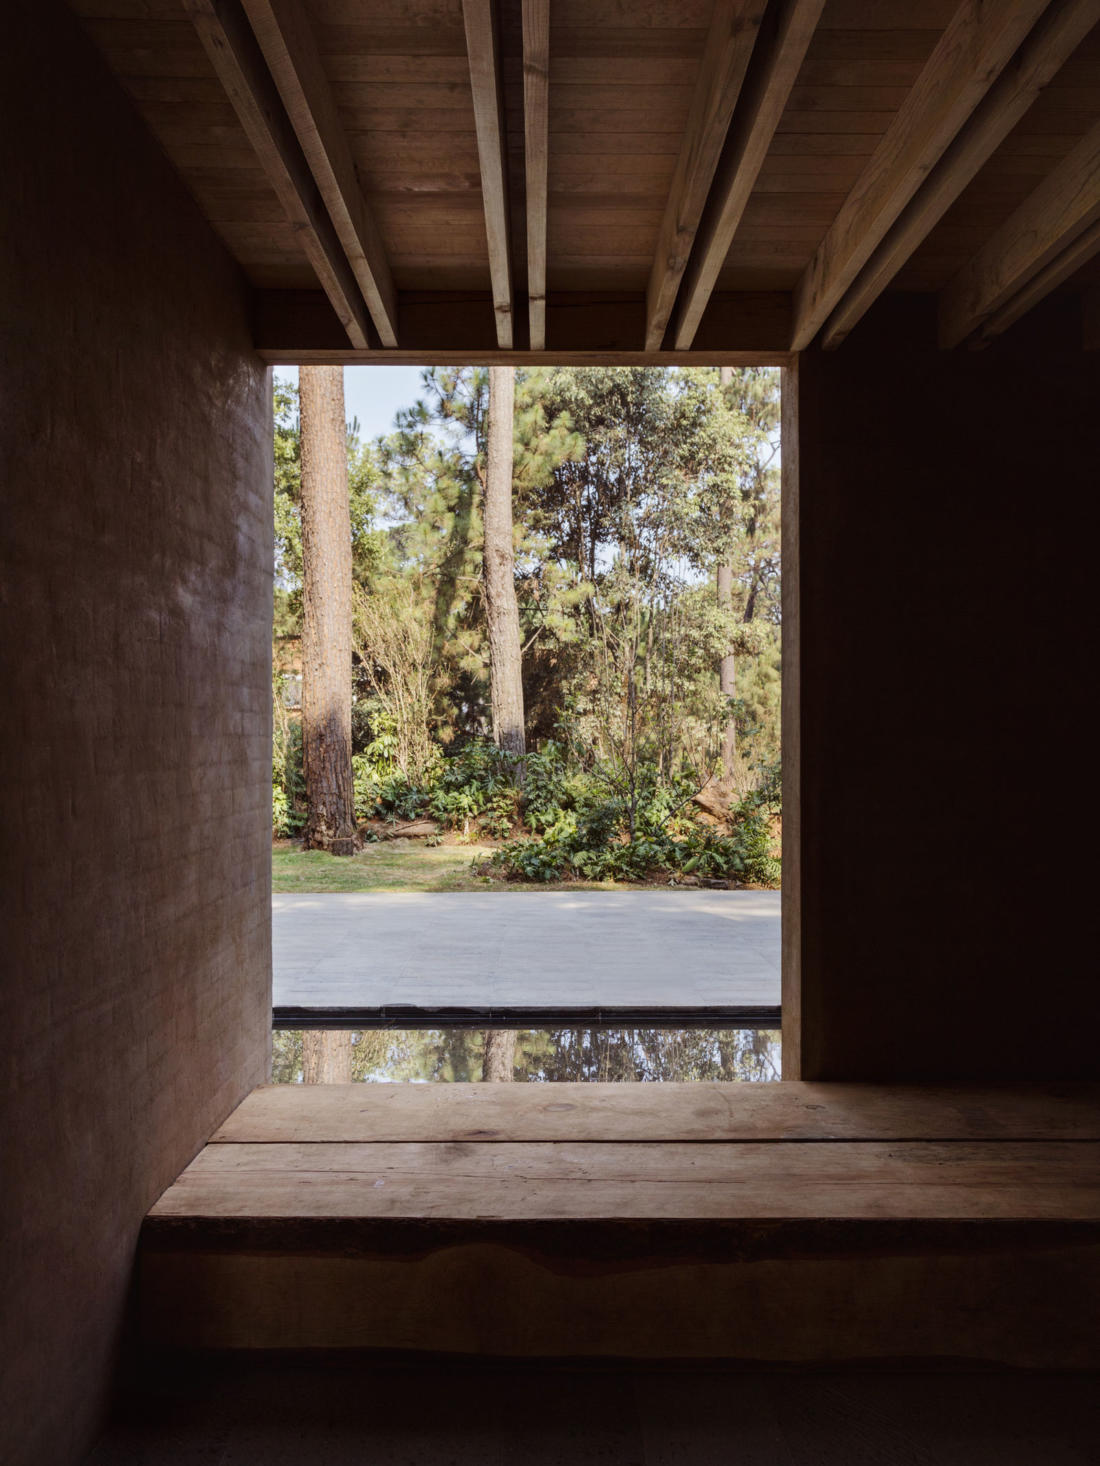 Проект таунхауса в Мексике от Taller Hector Barroso 11